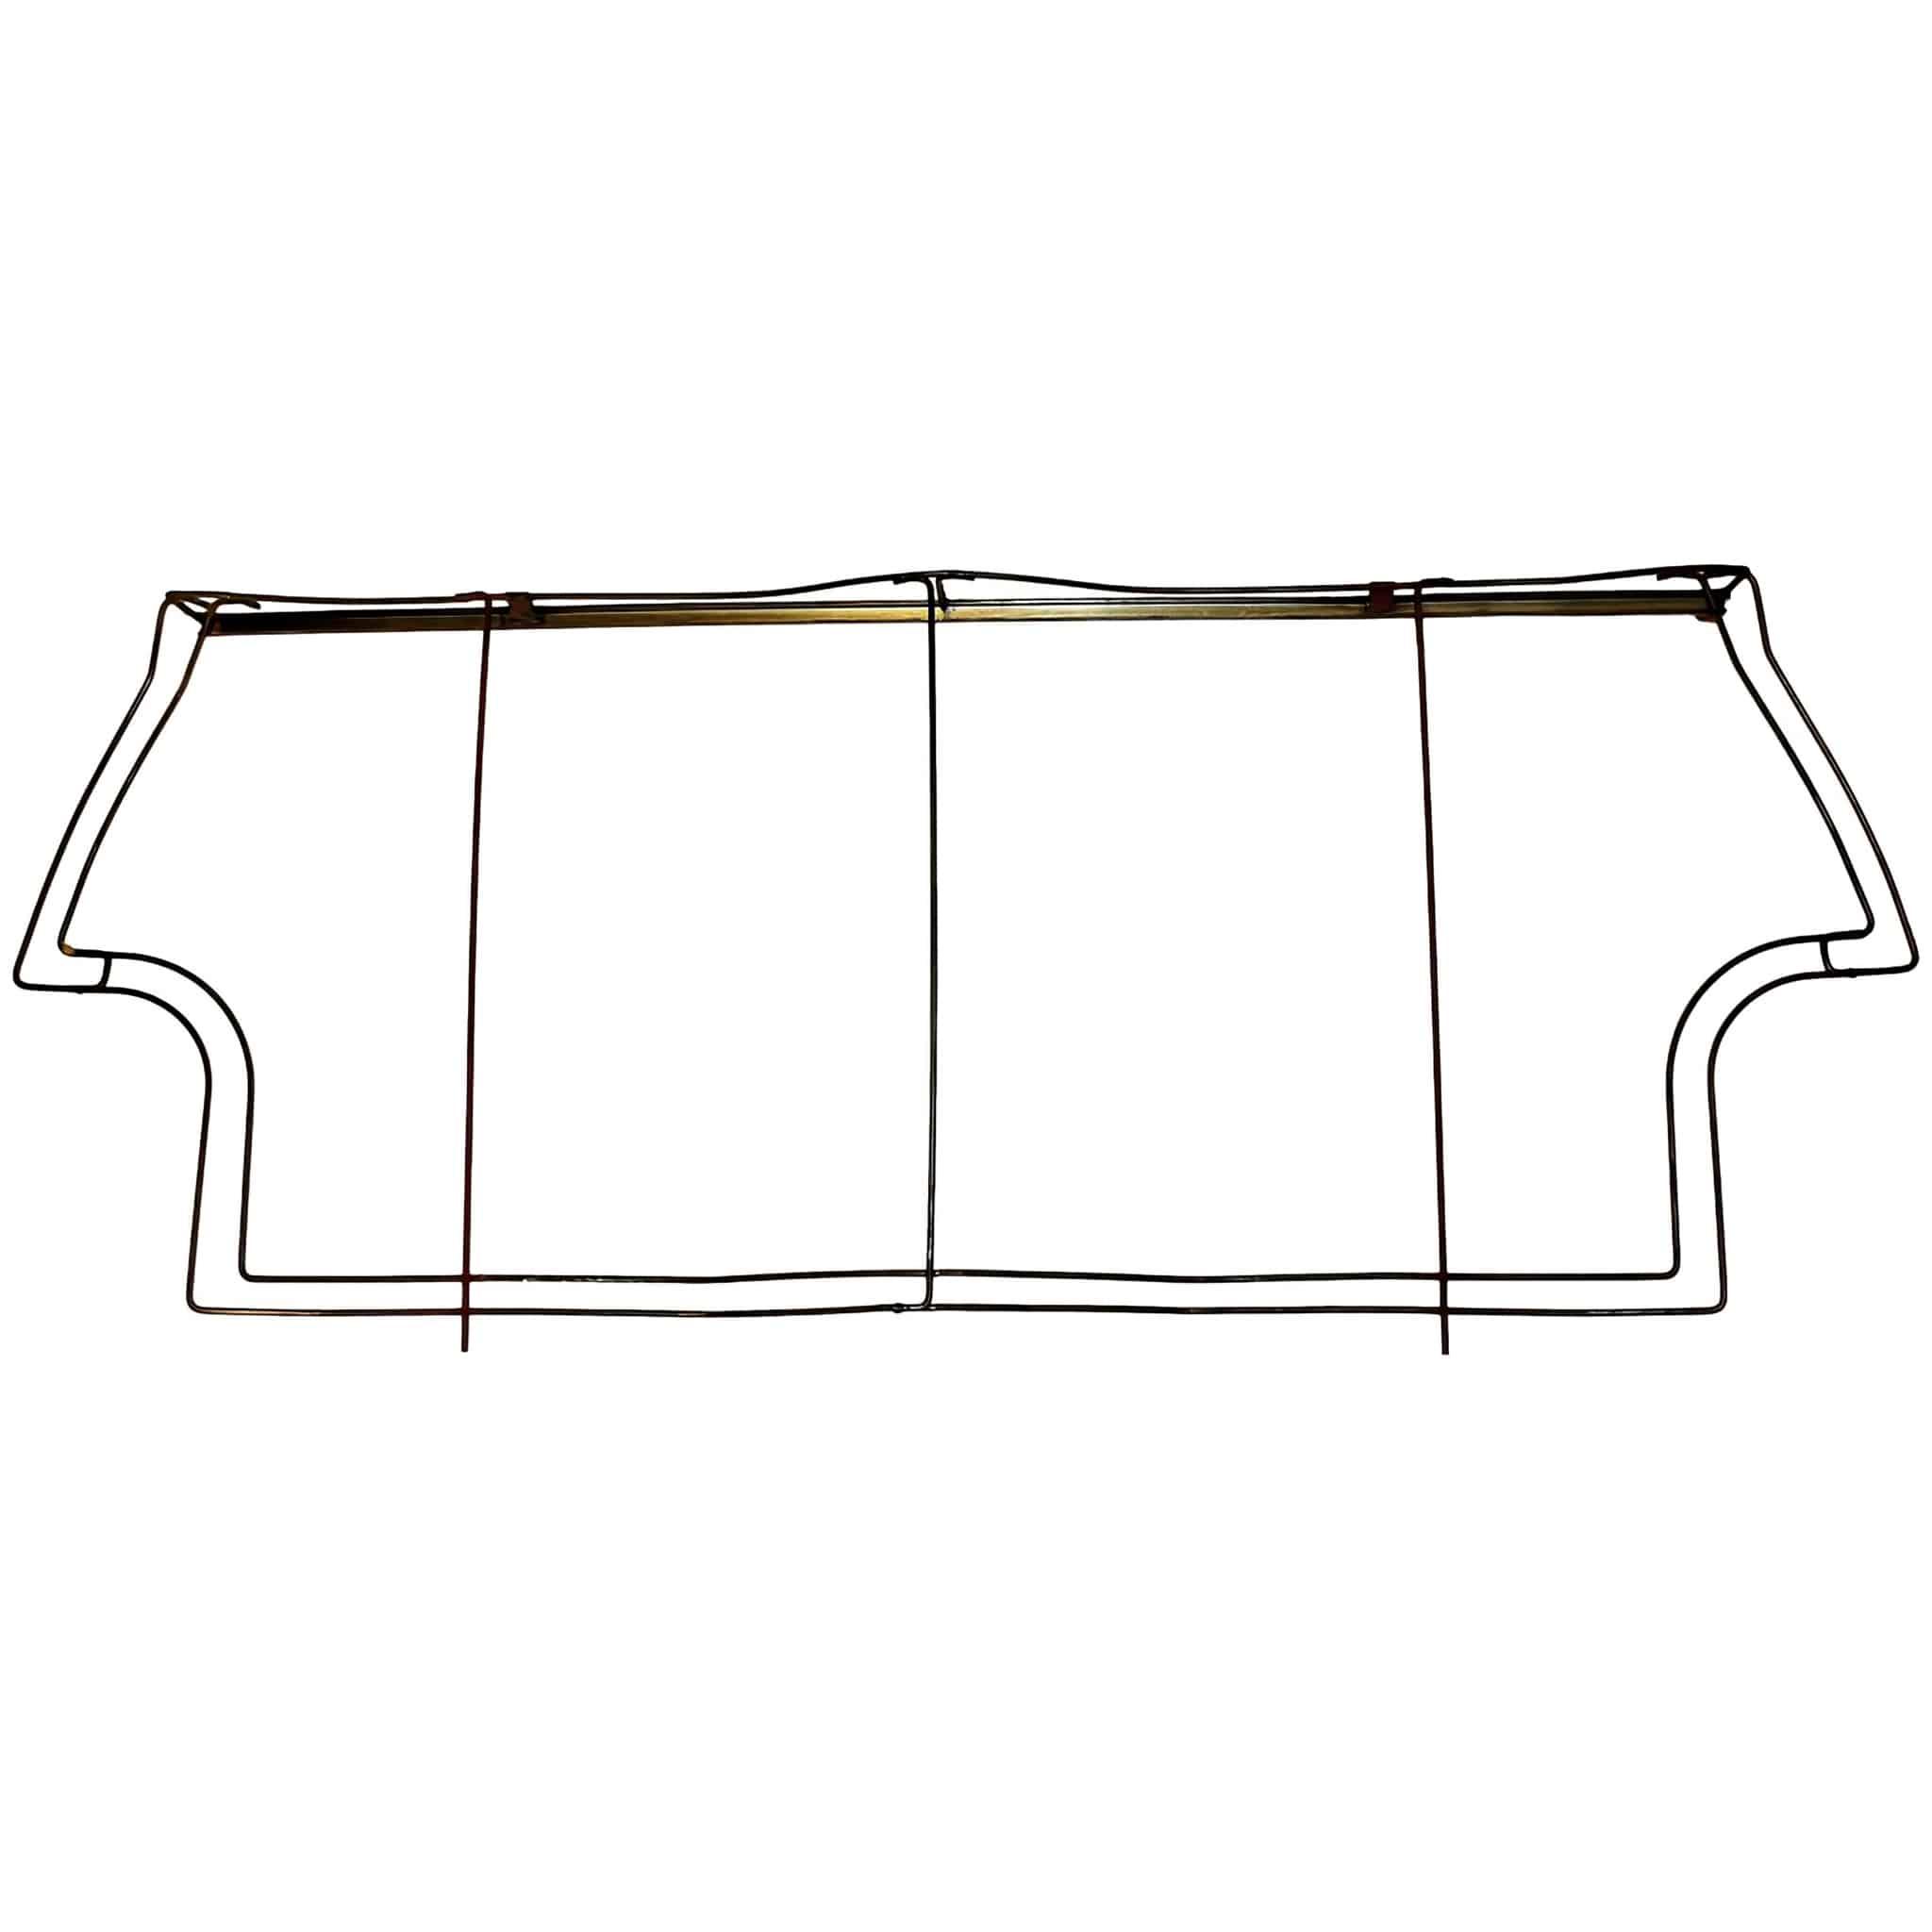 Rear Seat Frame, 1960-1970 Saloon